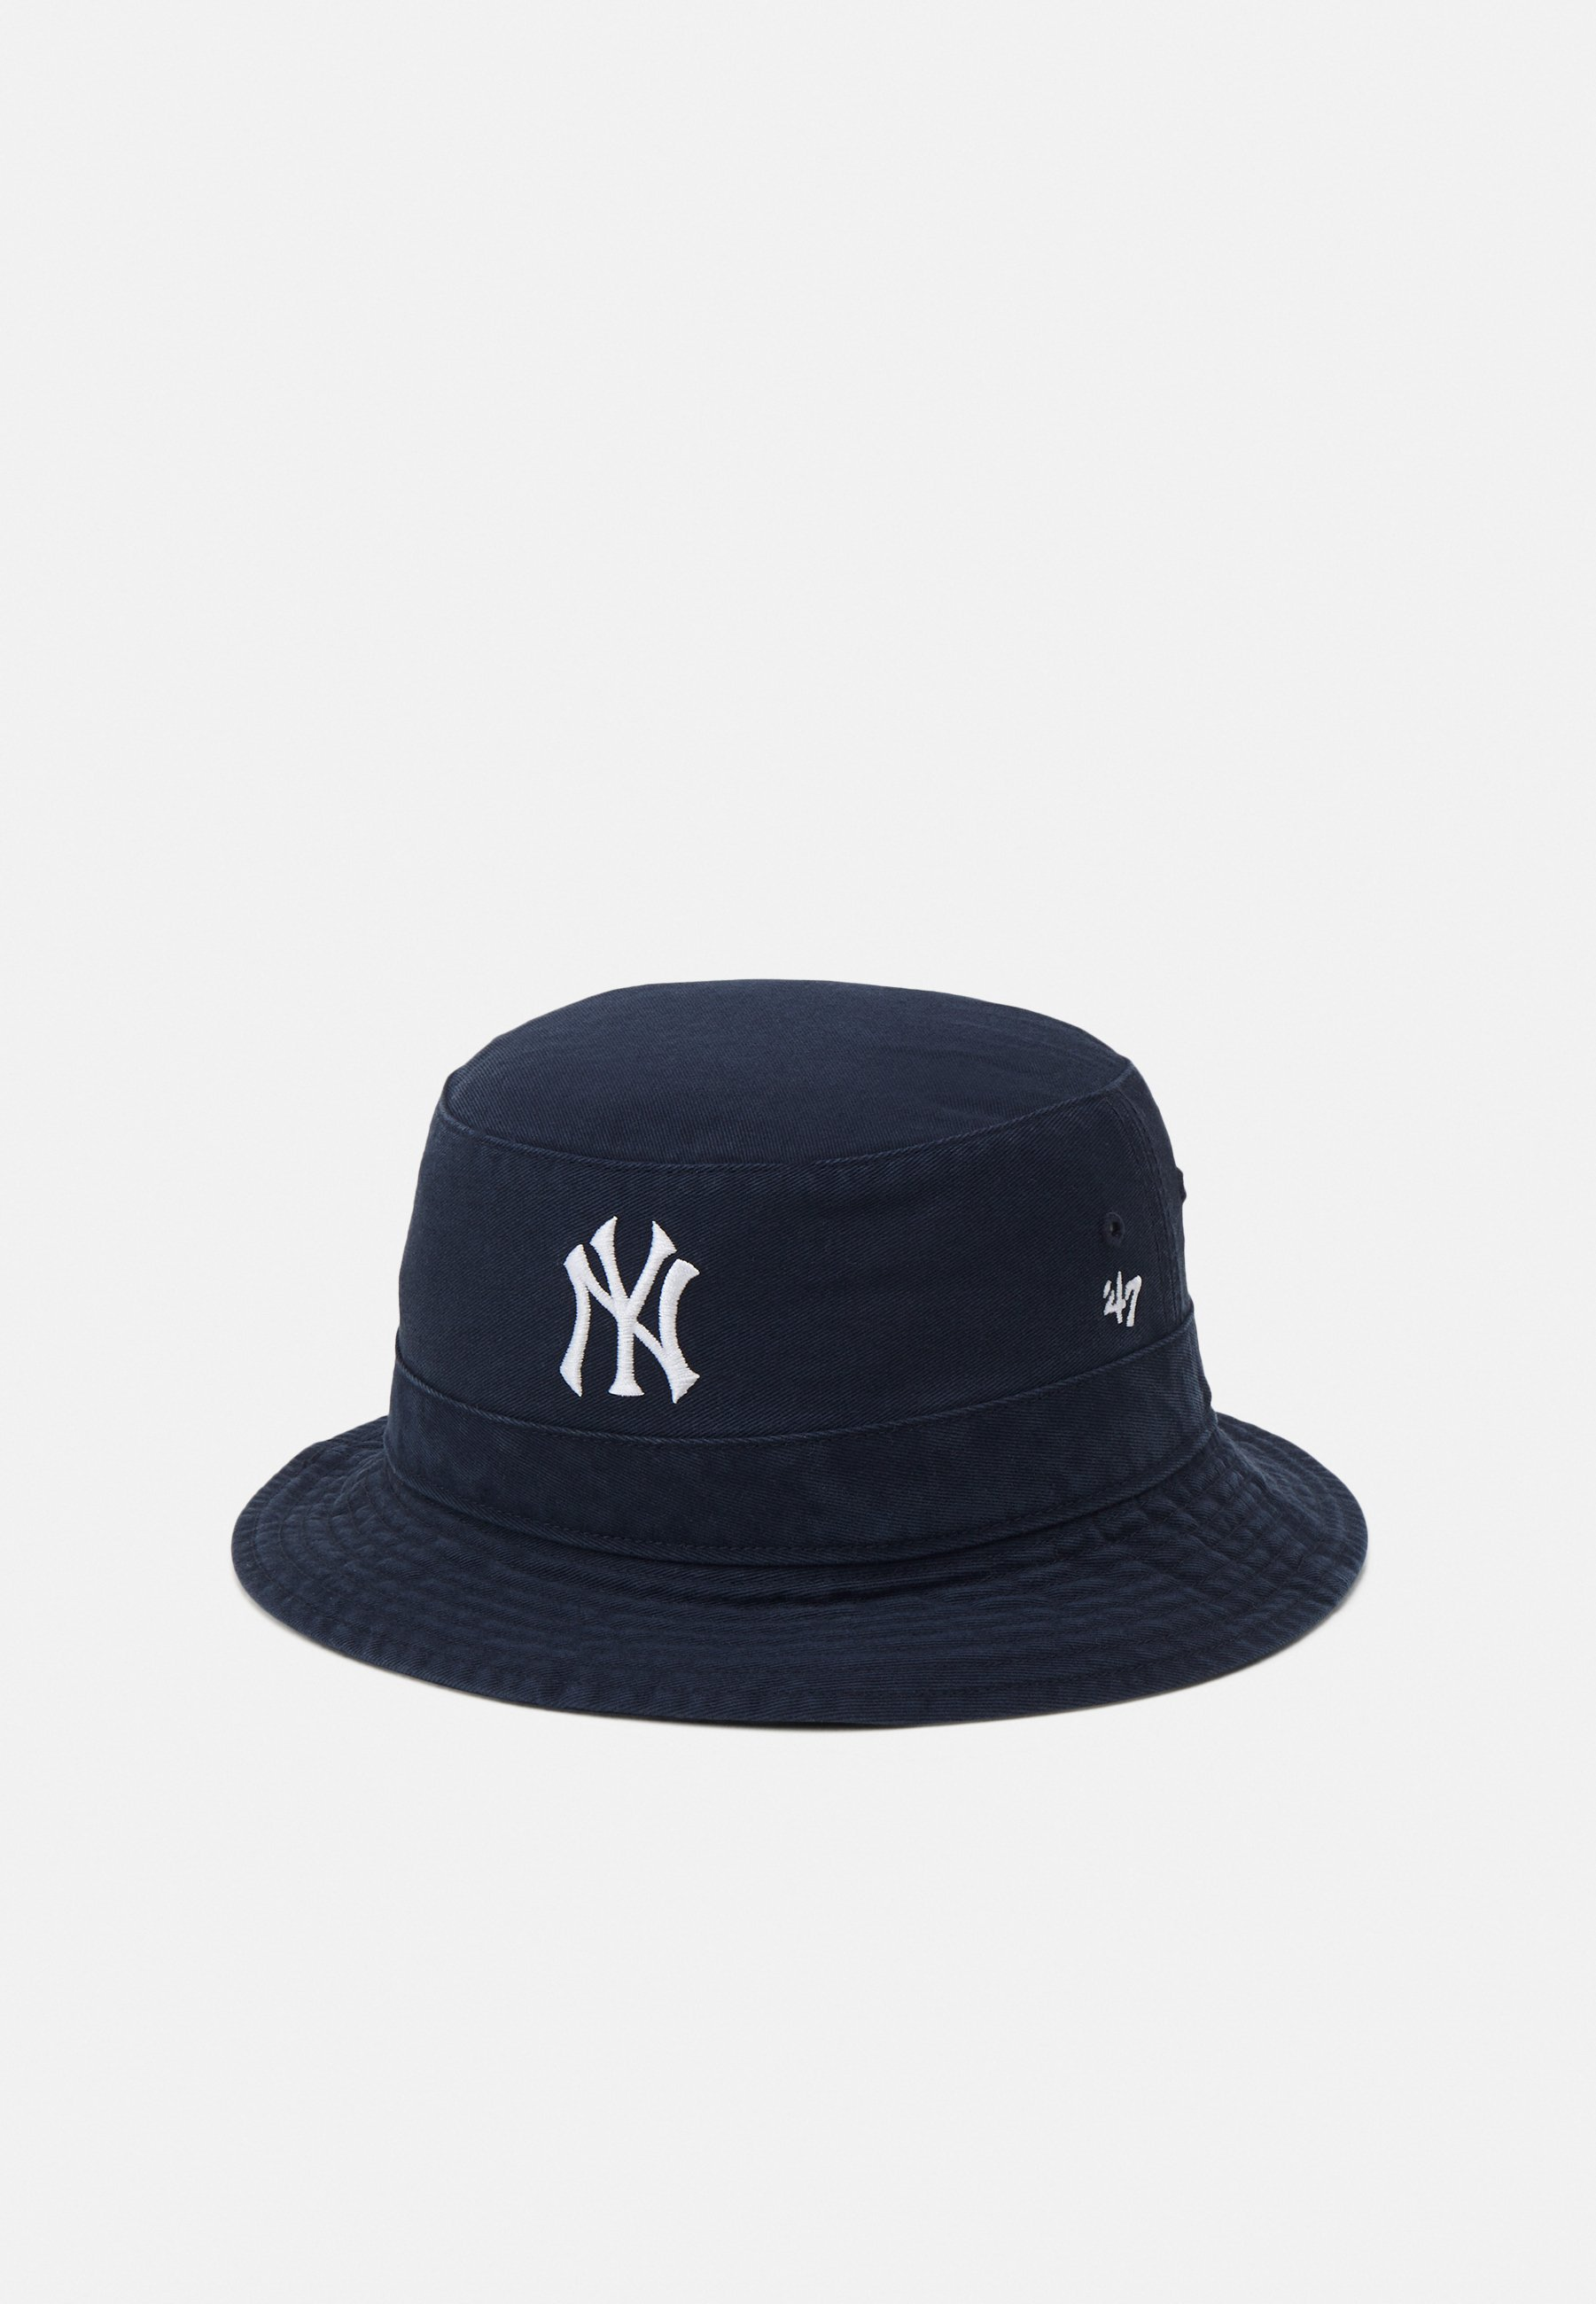 Homme NEW YORK YANKEES BUCKET UNISEX - Chapeau